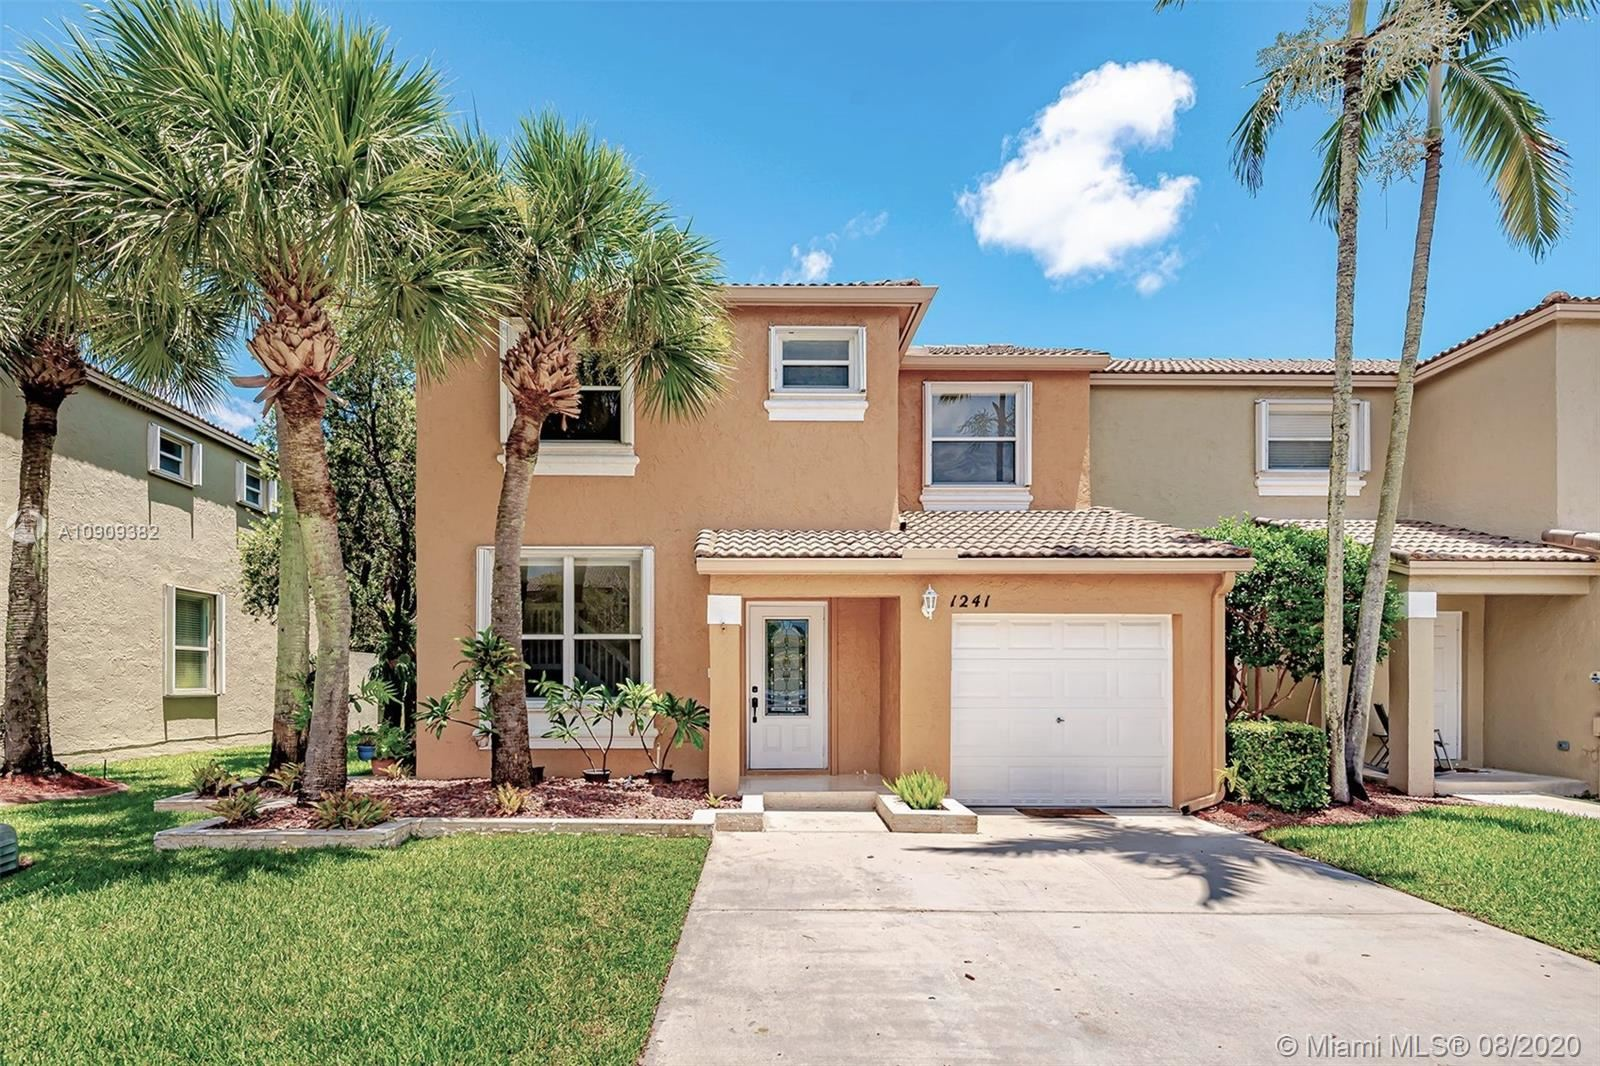 1241 NW 154th Ave #1241, Pembroke Pines, FL 33028 - #: A10909382